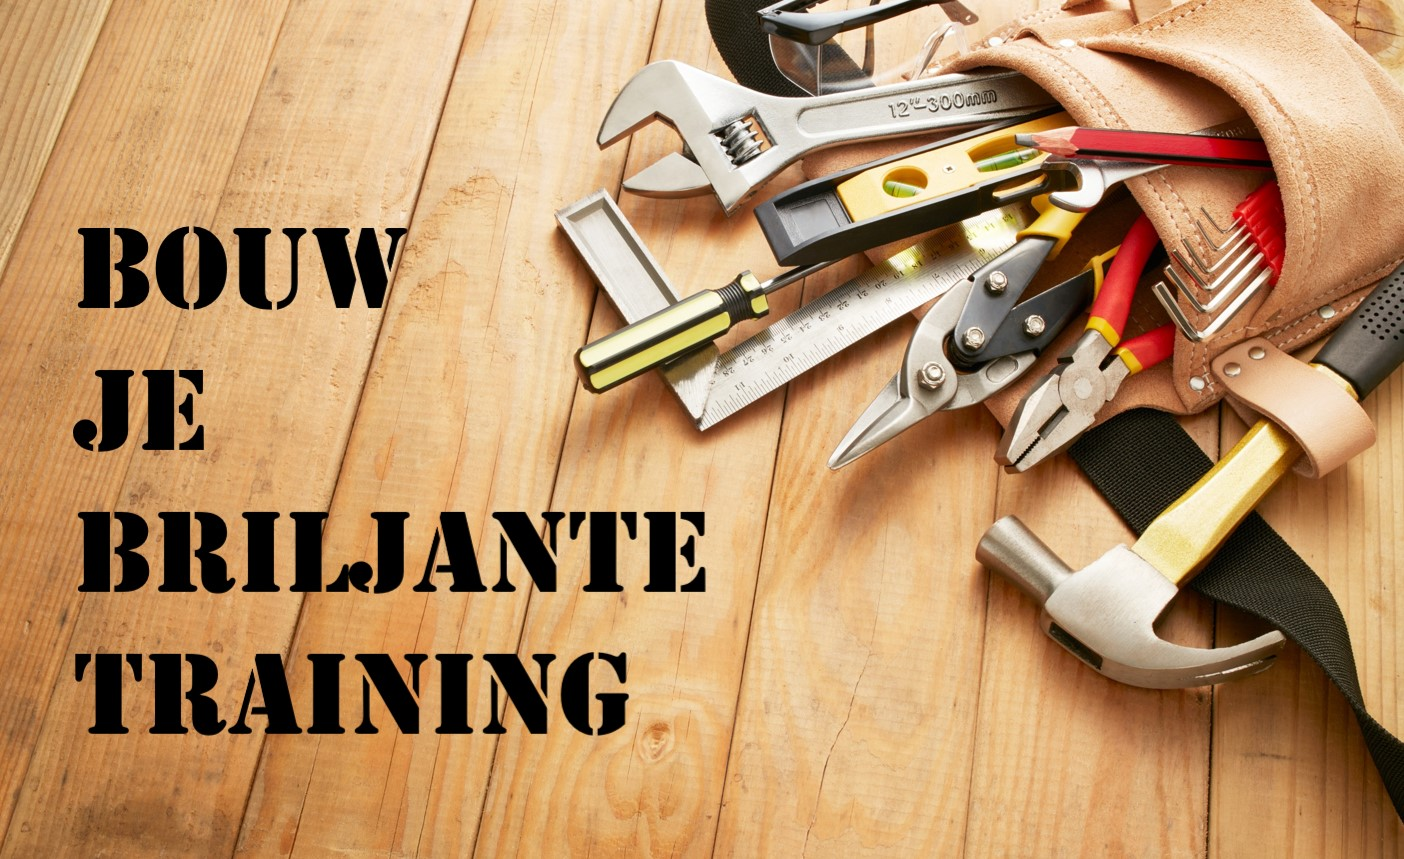 Bouw je briljante training